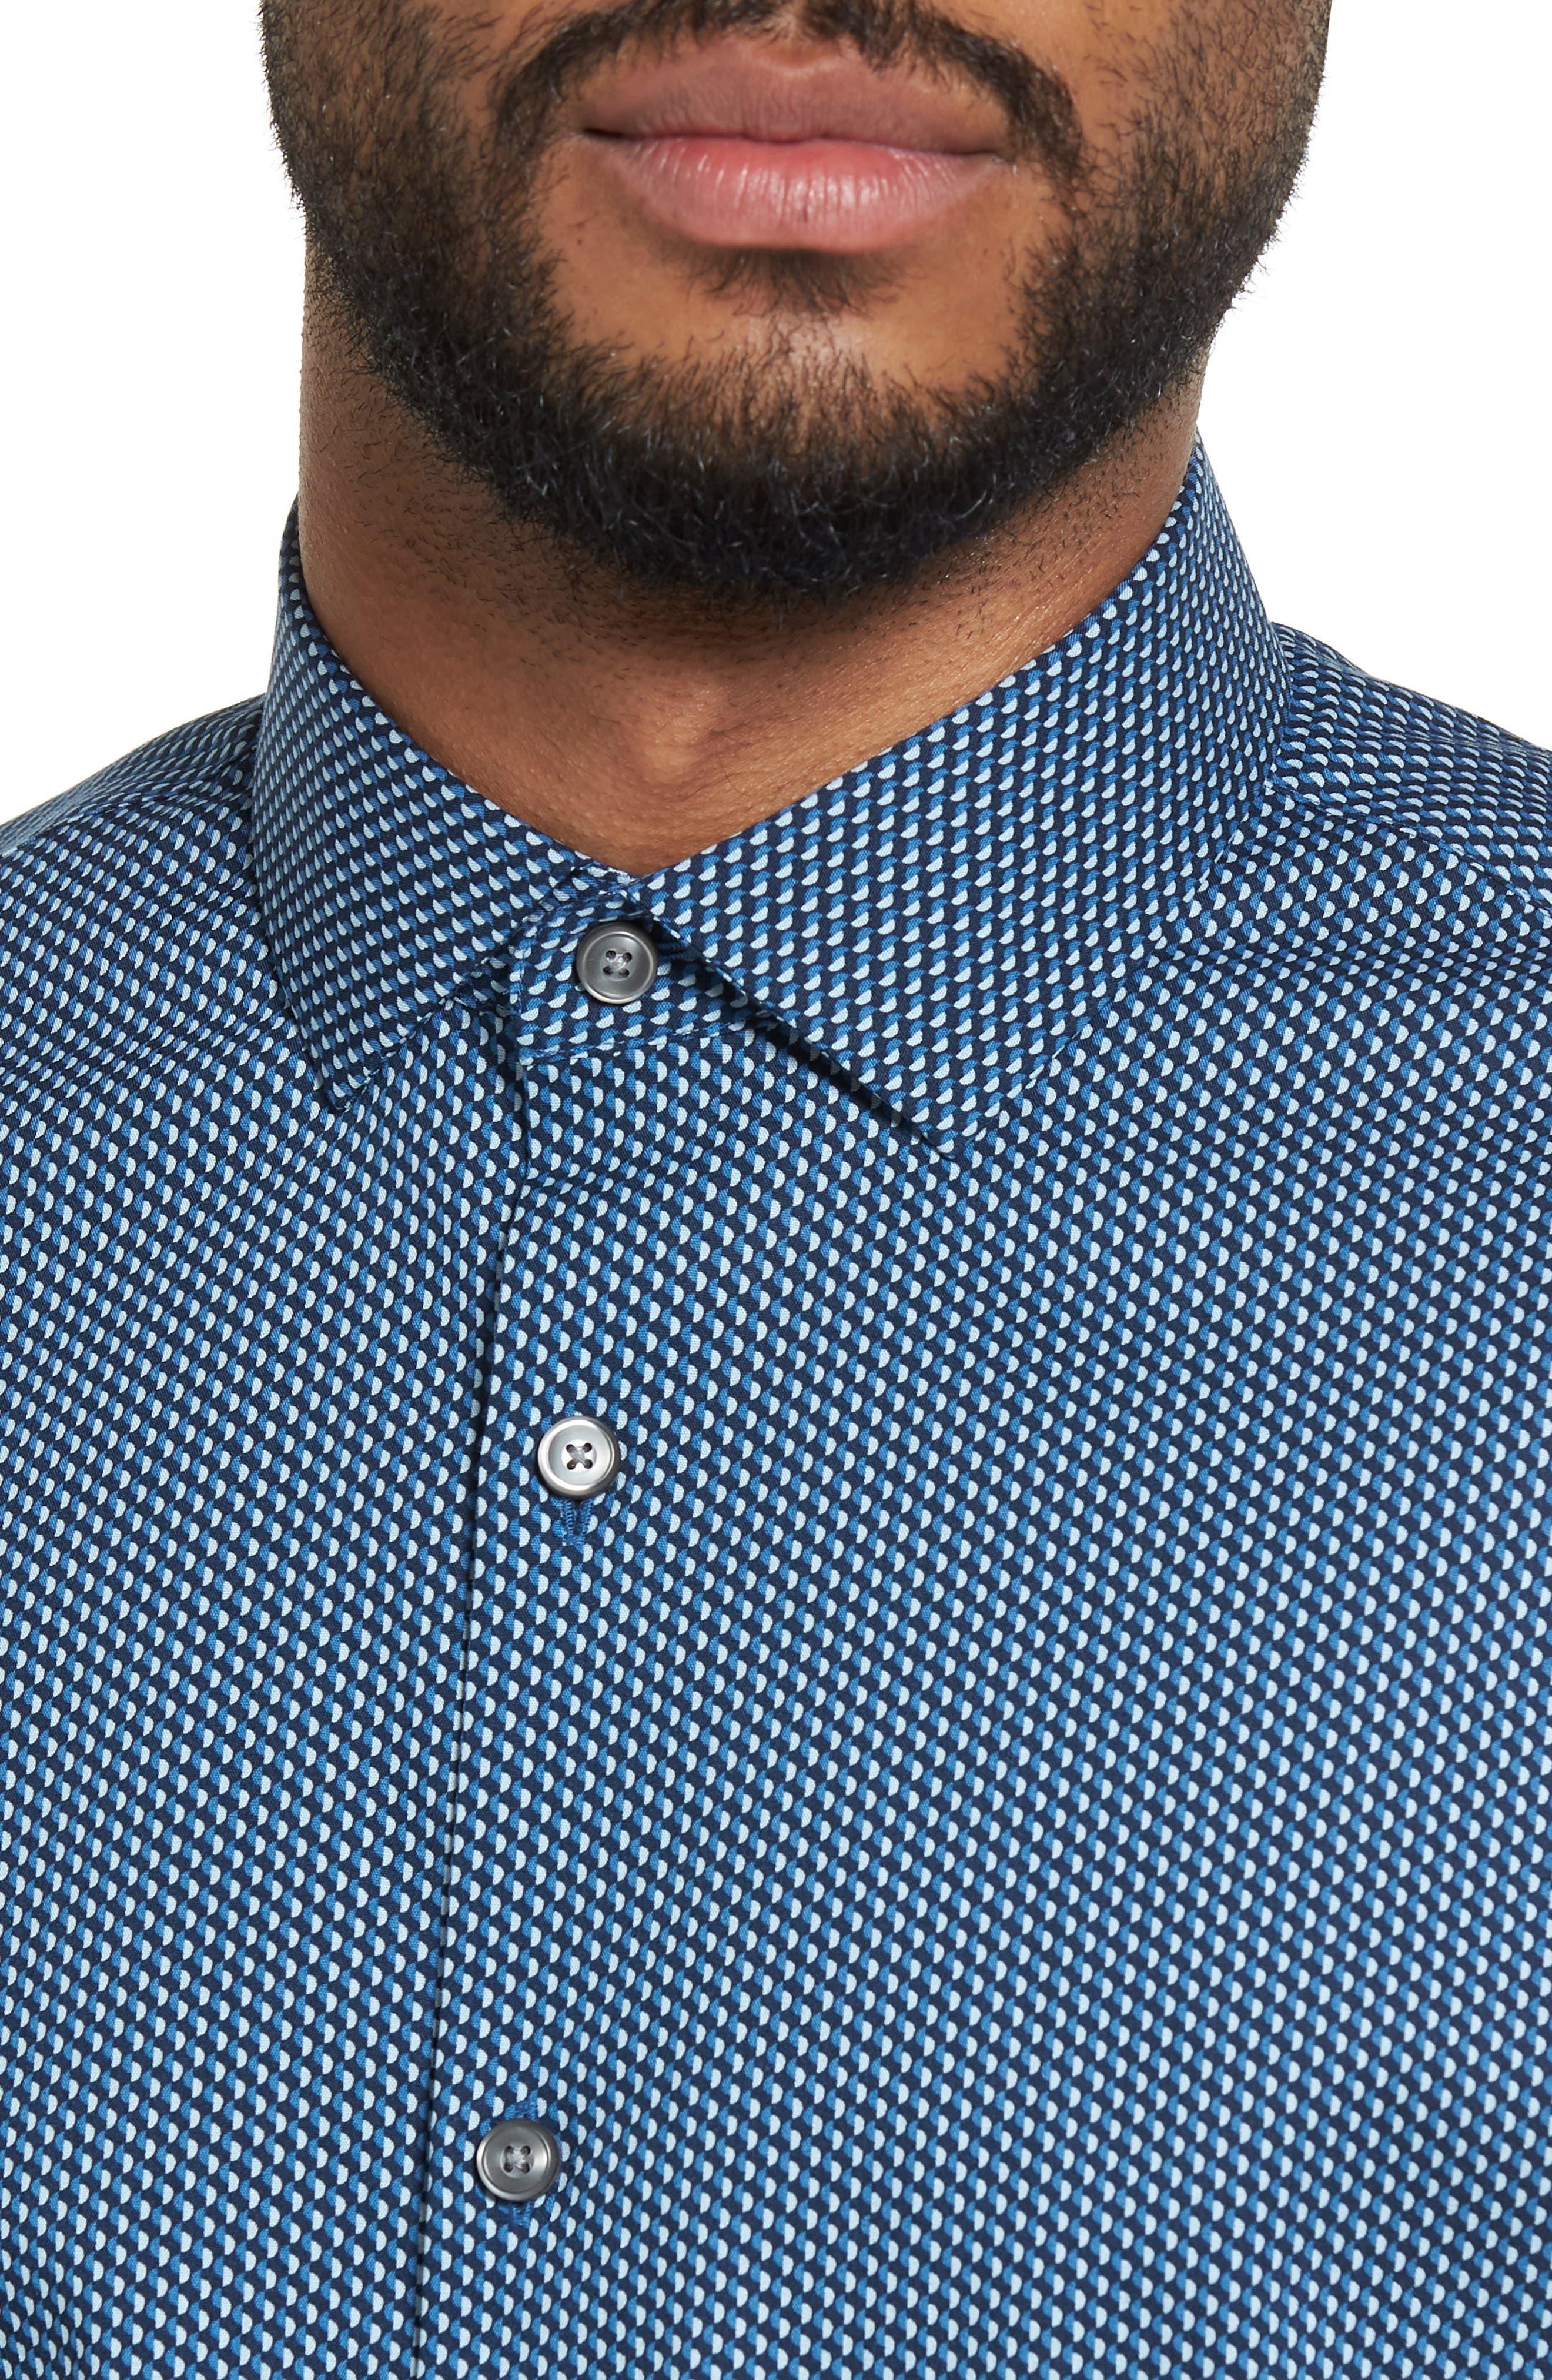 Print Sport Shirt,                             Alternate thumbnail 4, color,                             Blue Ice Navy Geo Print